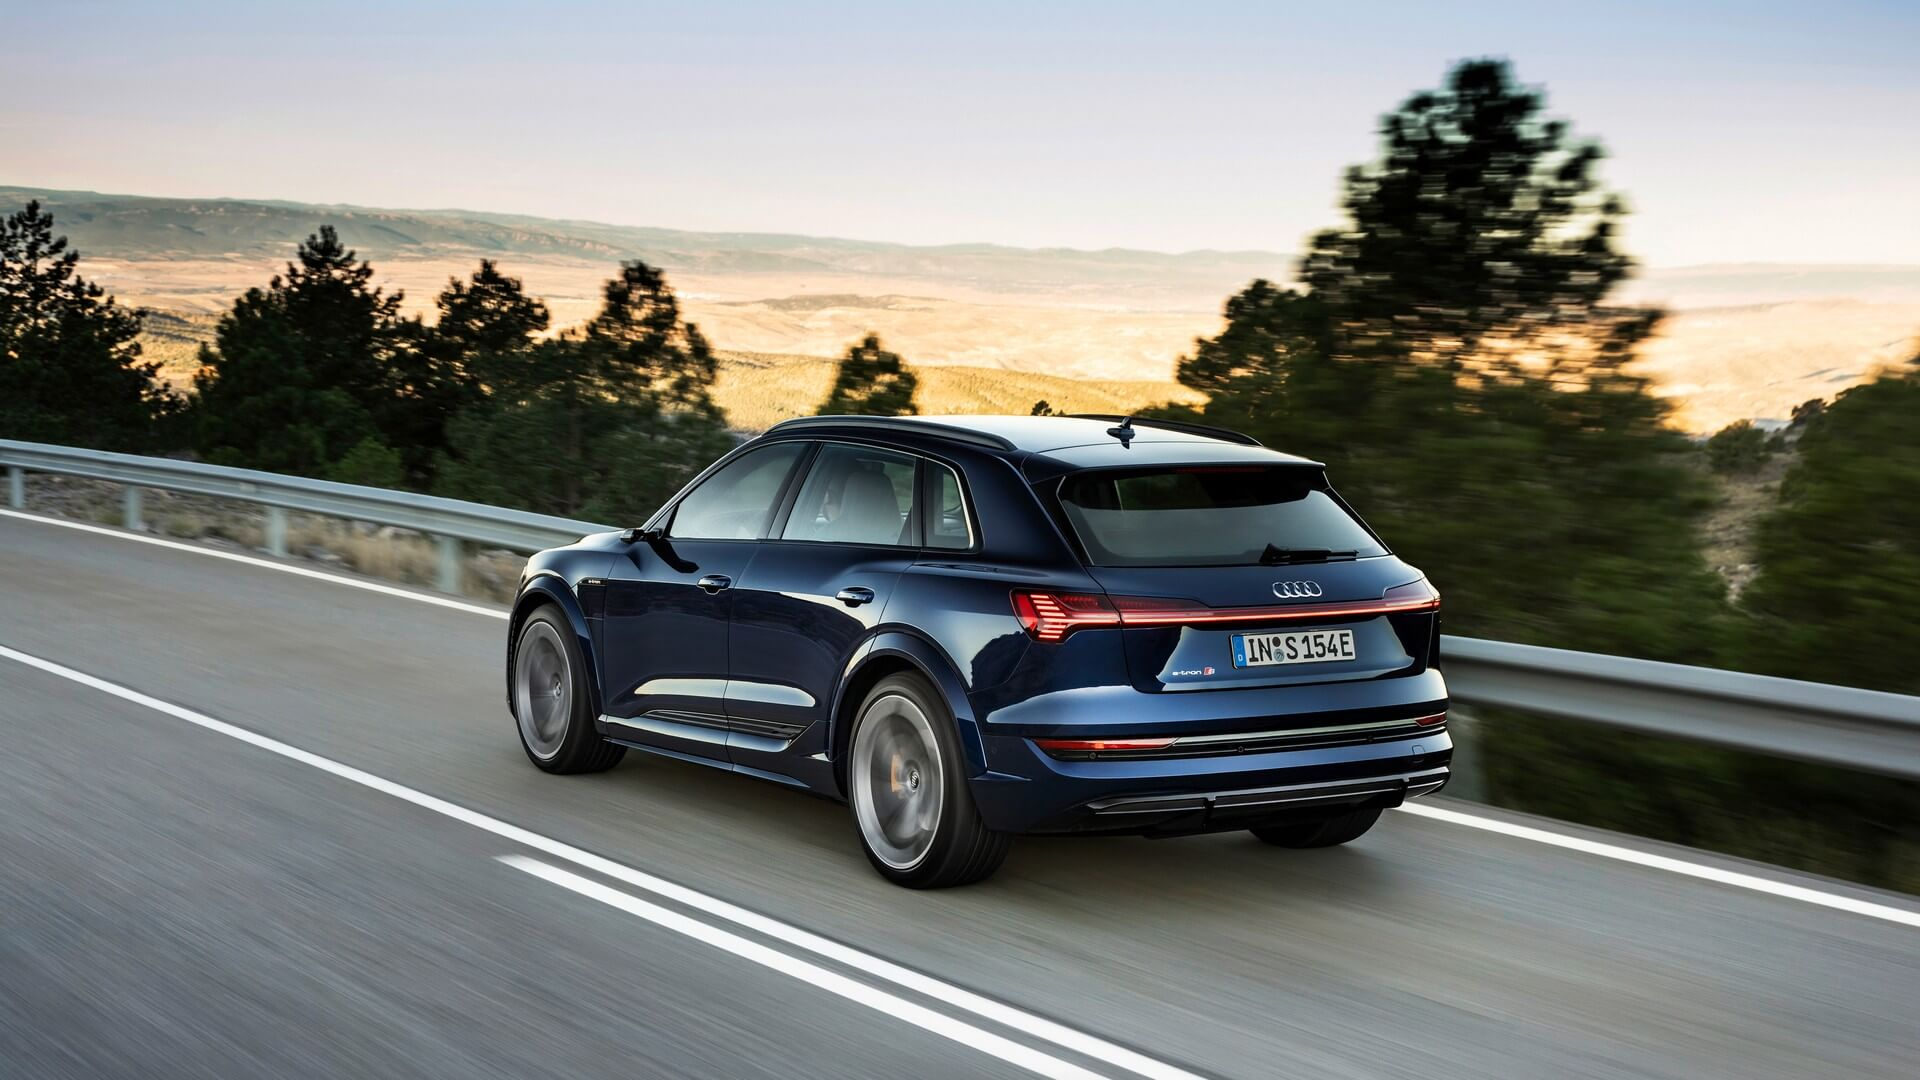 Audi-E-Tron-S-and-E-Tron-S-Sportback-2020-8